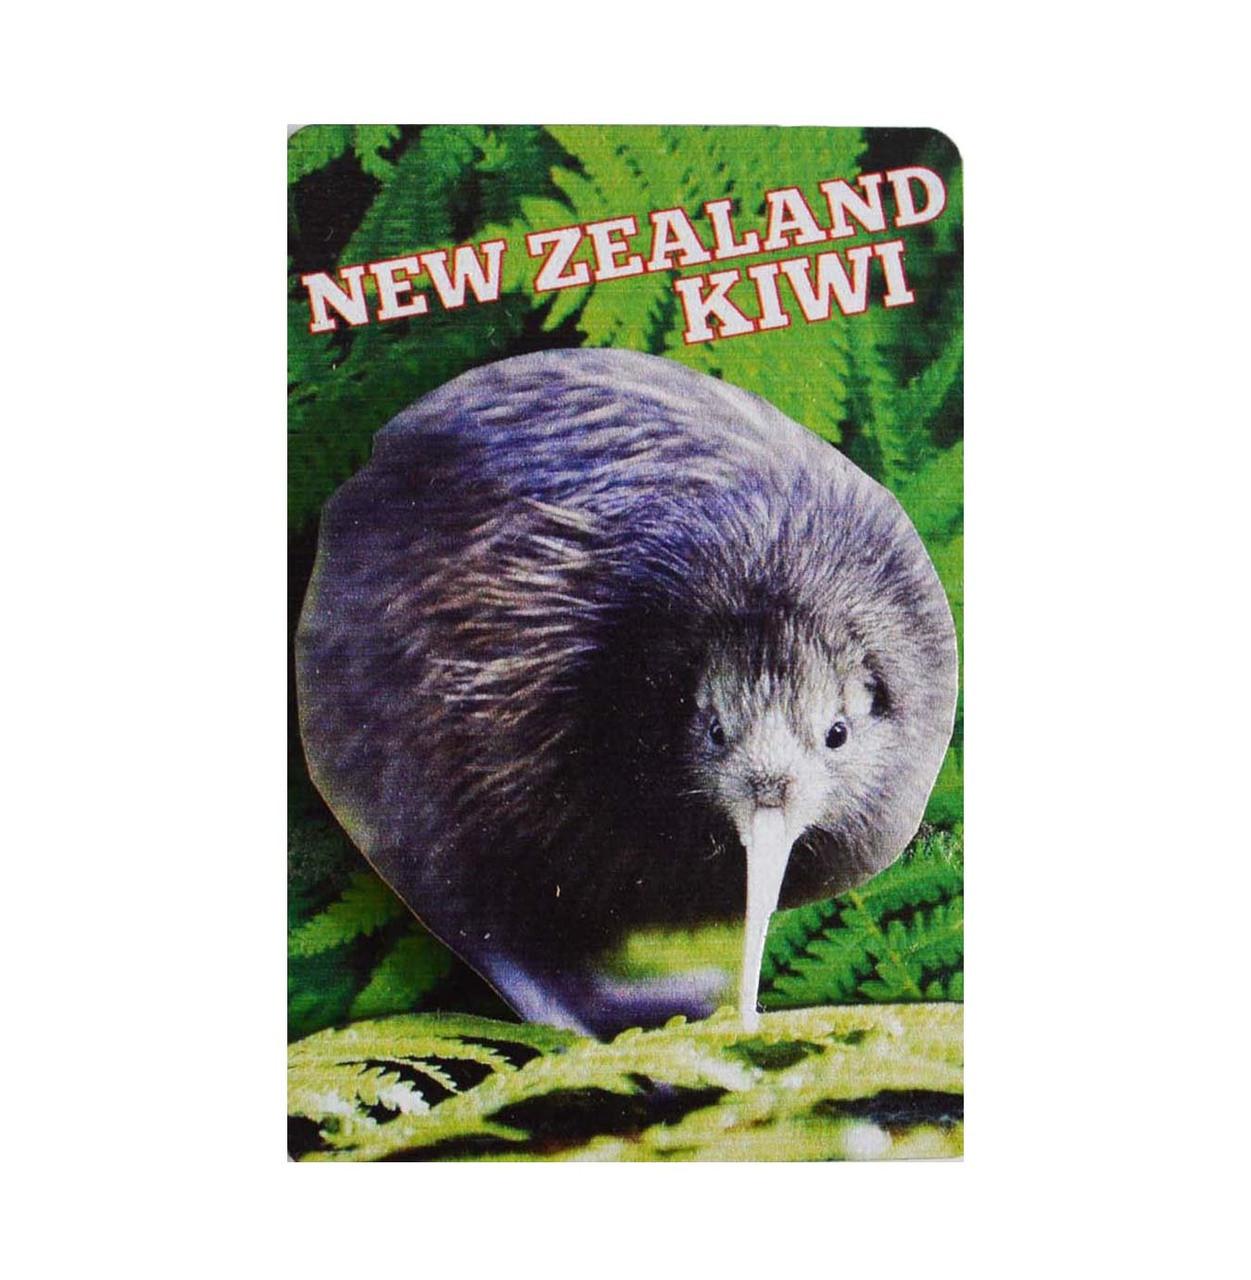 BCMG524 3D Magnet - Native NZ Birds - Kiwi